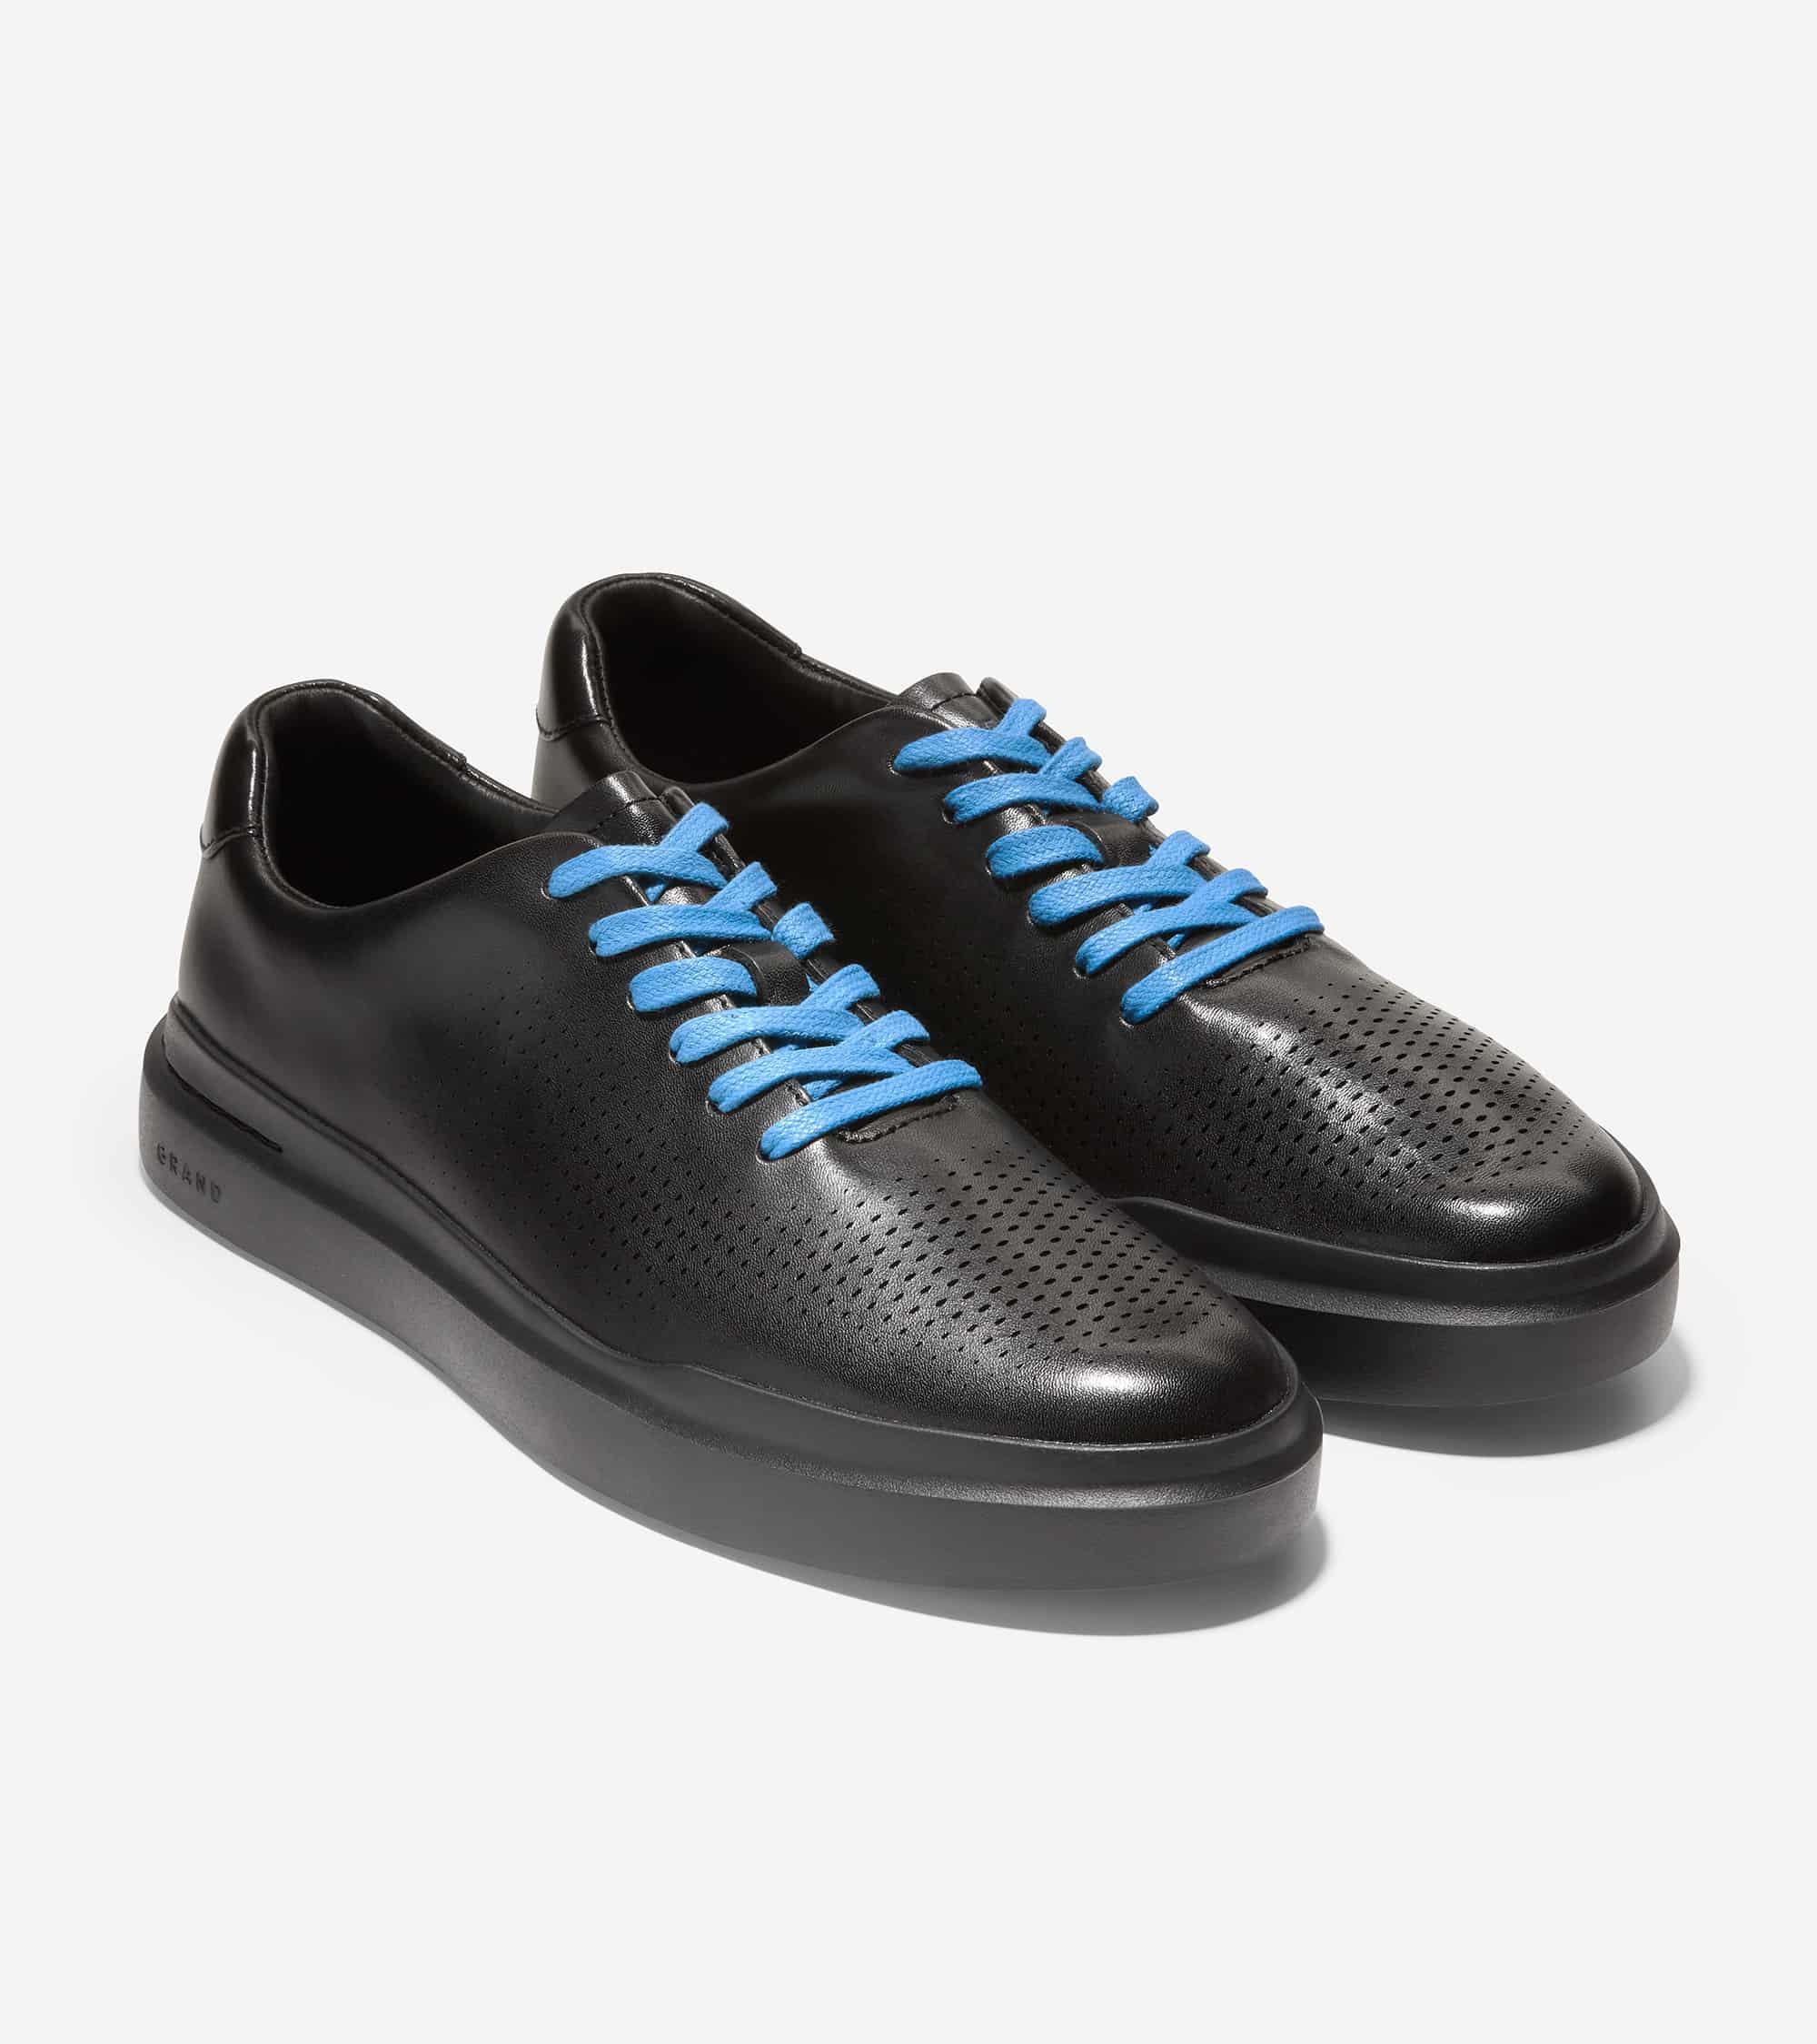 Cole Haan GrandPrø Rally Laser Cut Sneaker Black Leather /Bl